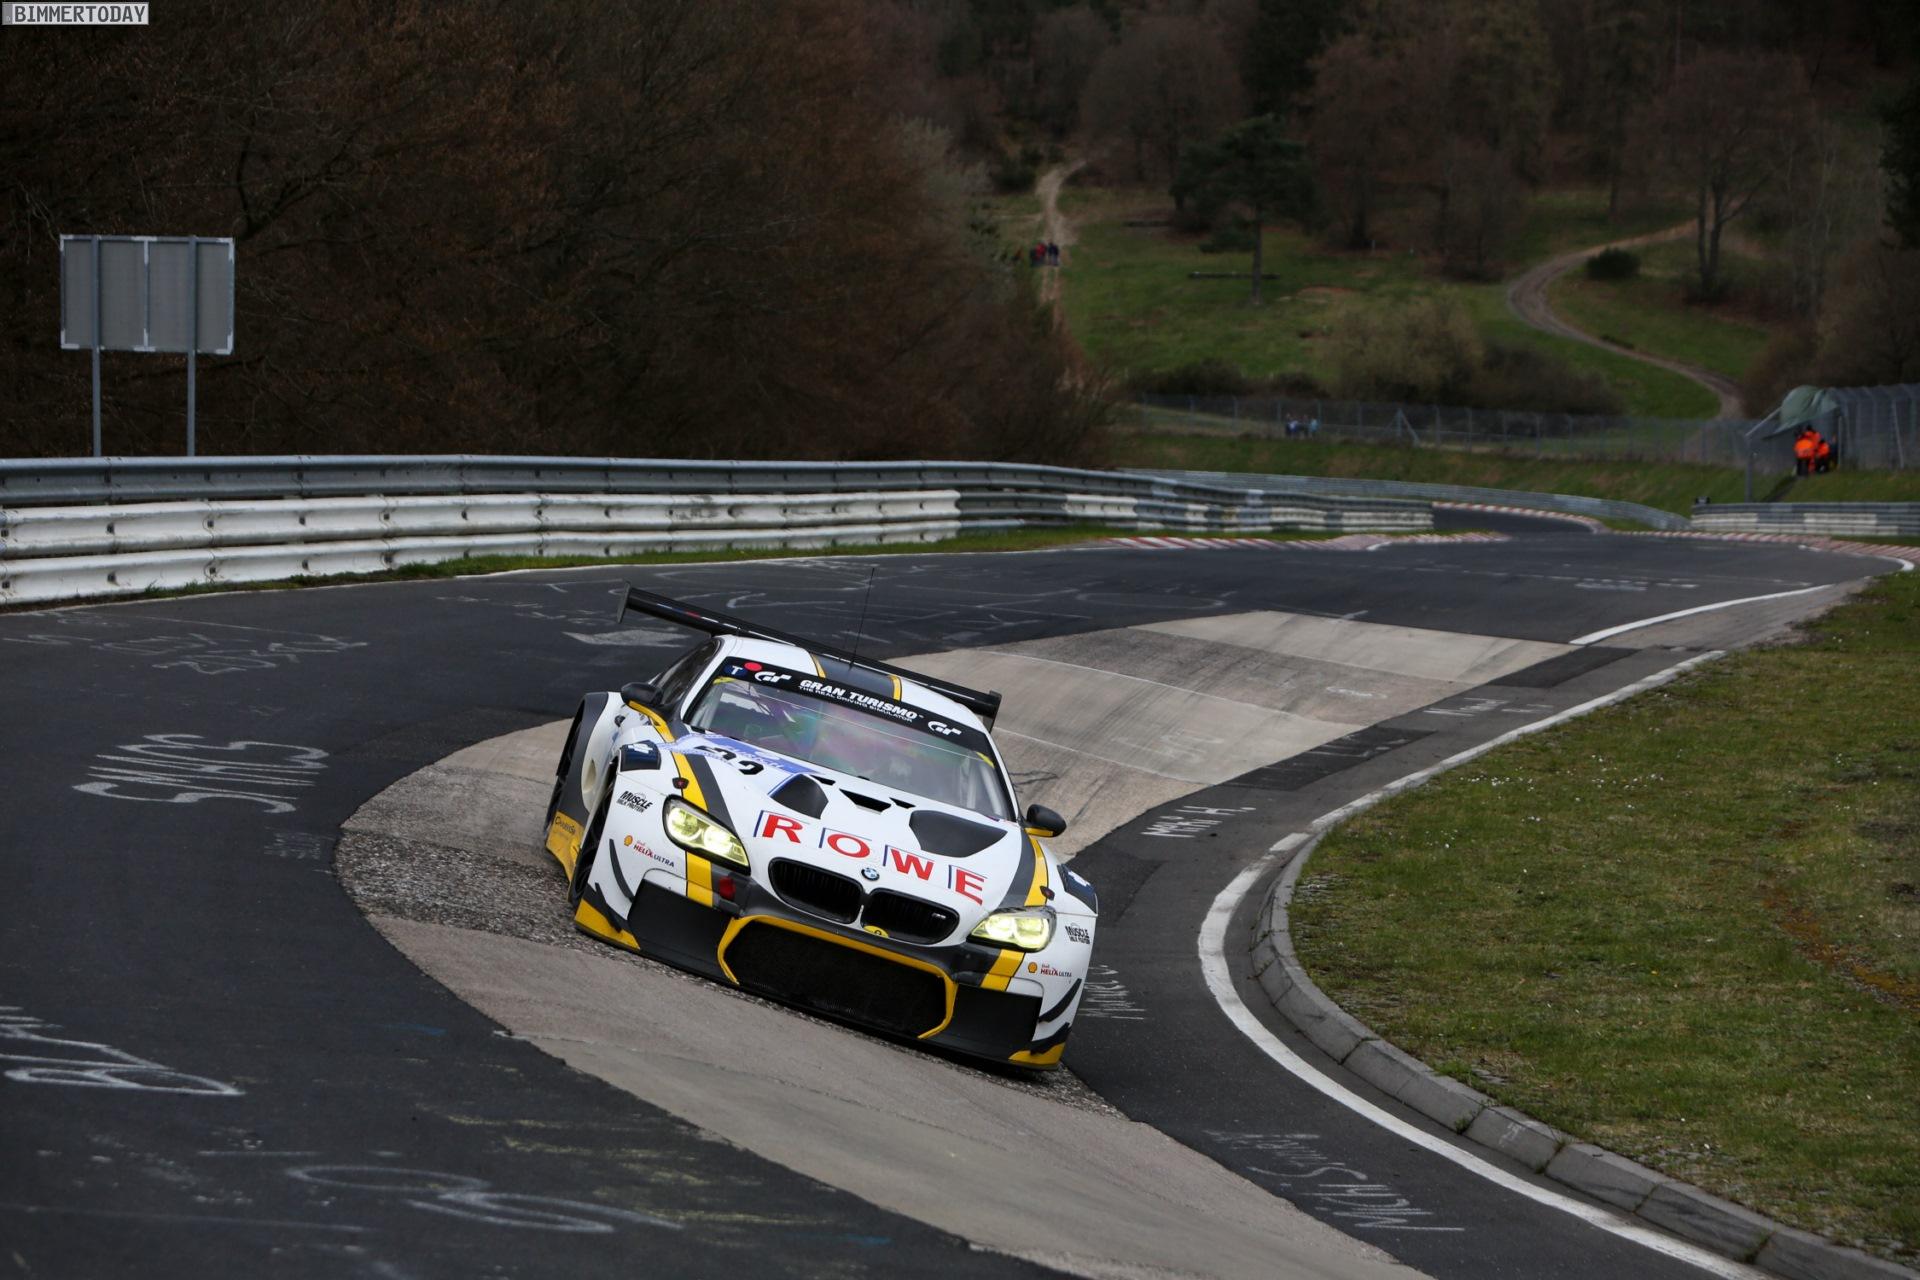 24h Nürburgring 2016: BMW M6 GT3 im Kreis der Favoriten